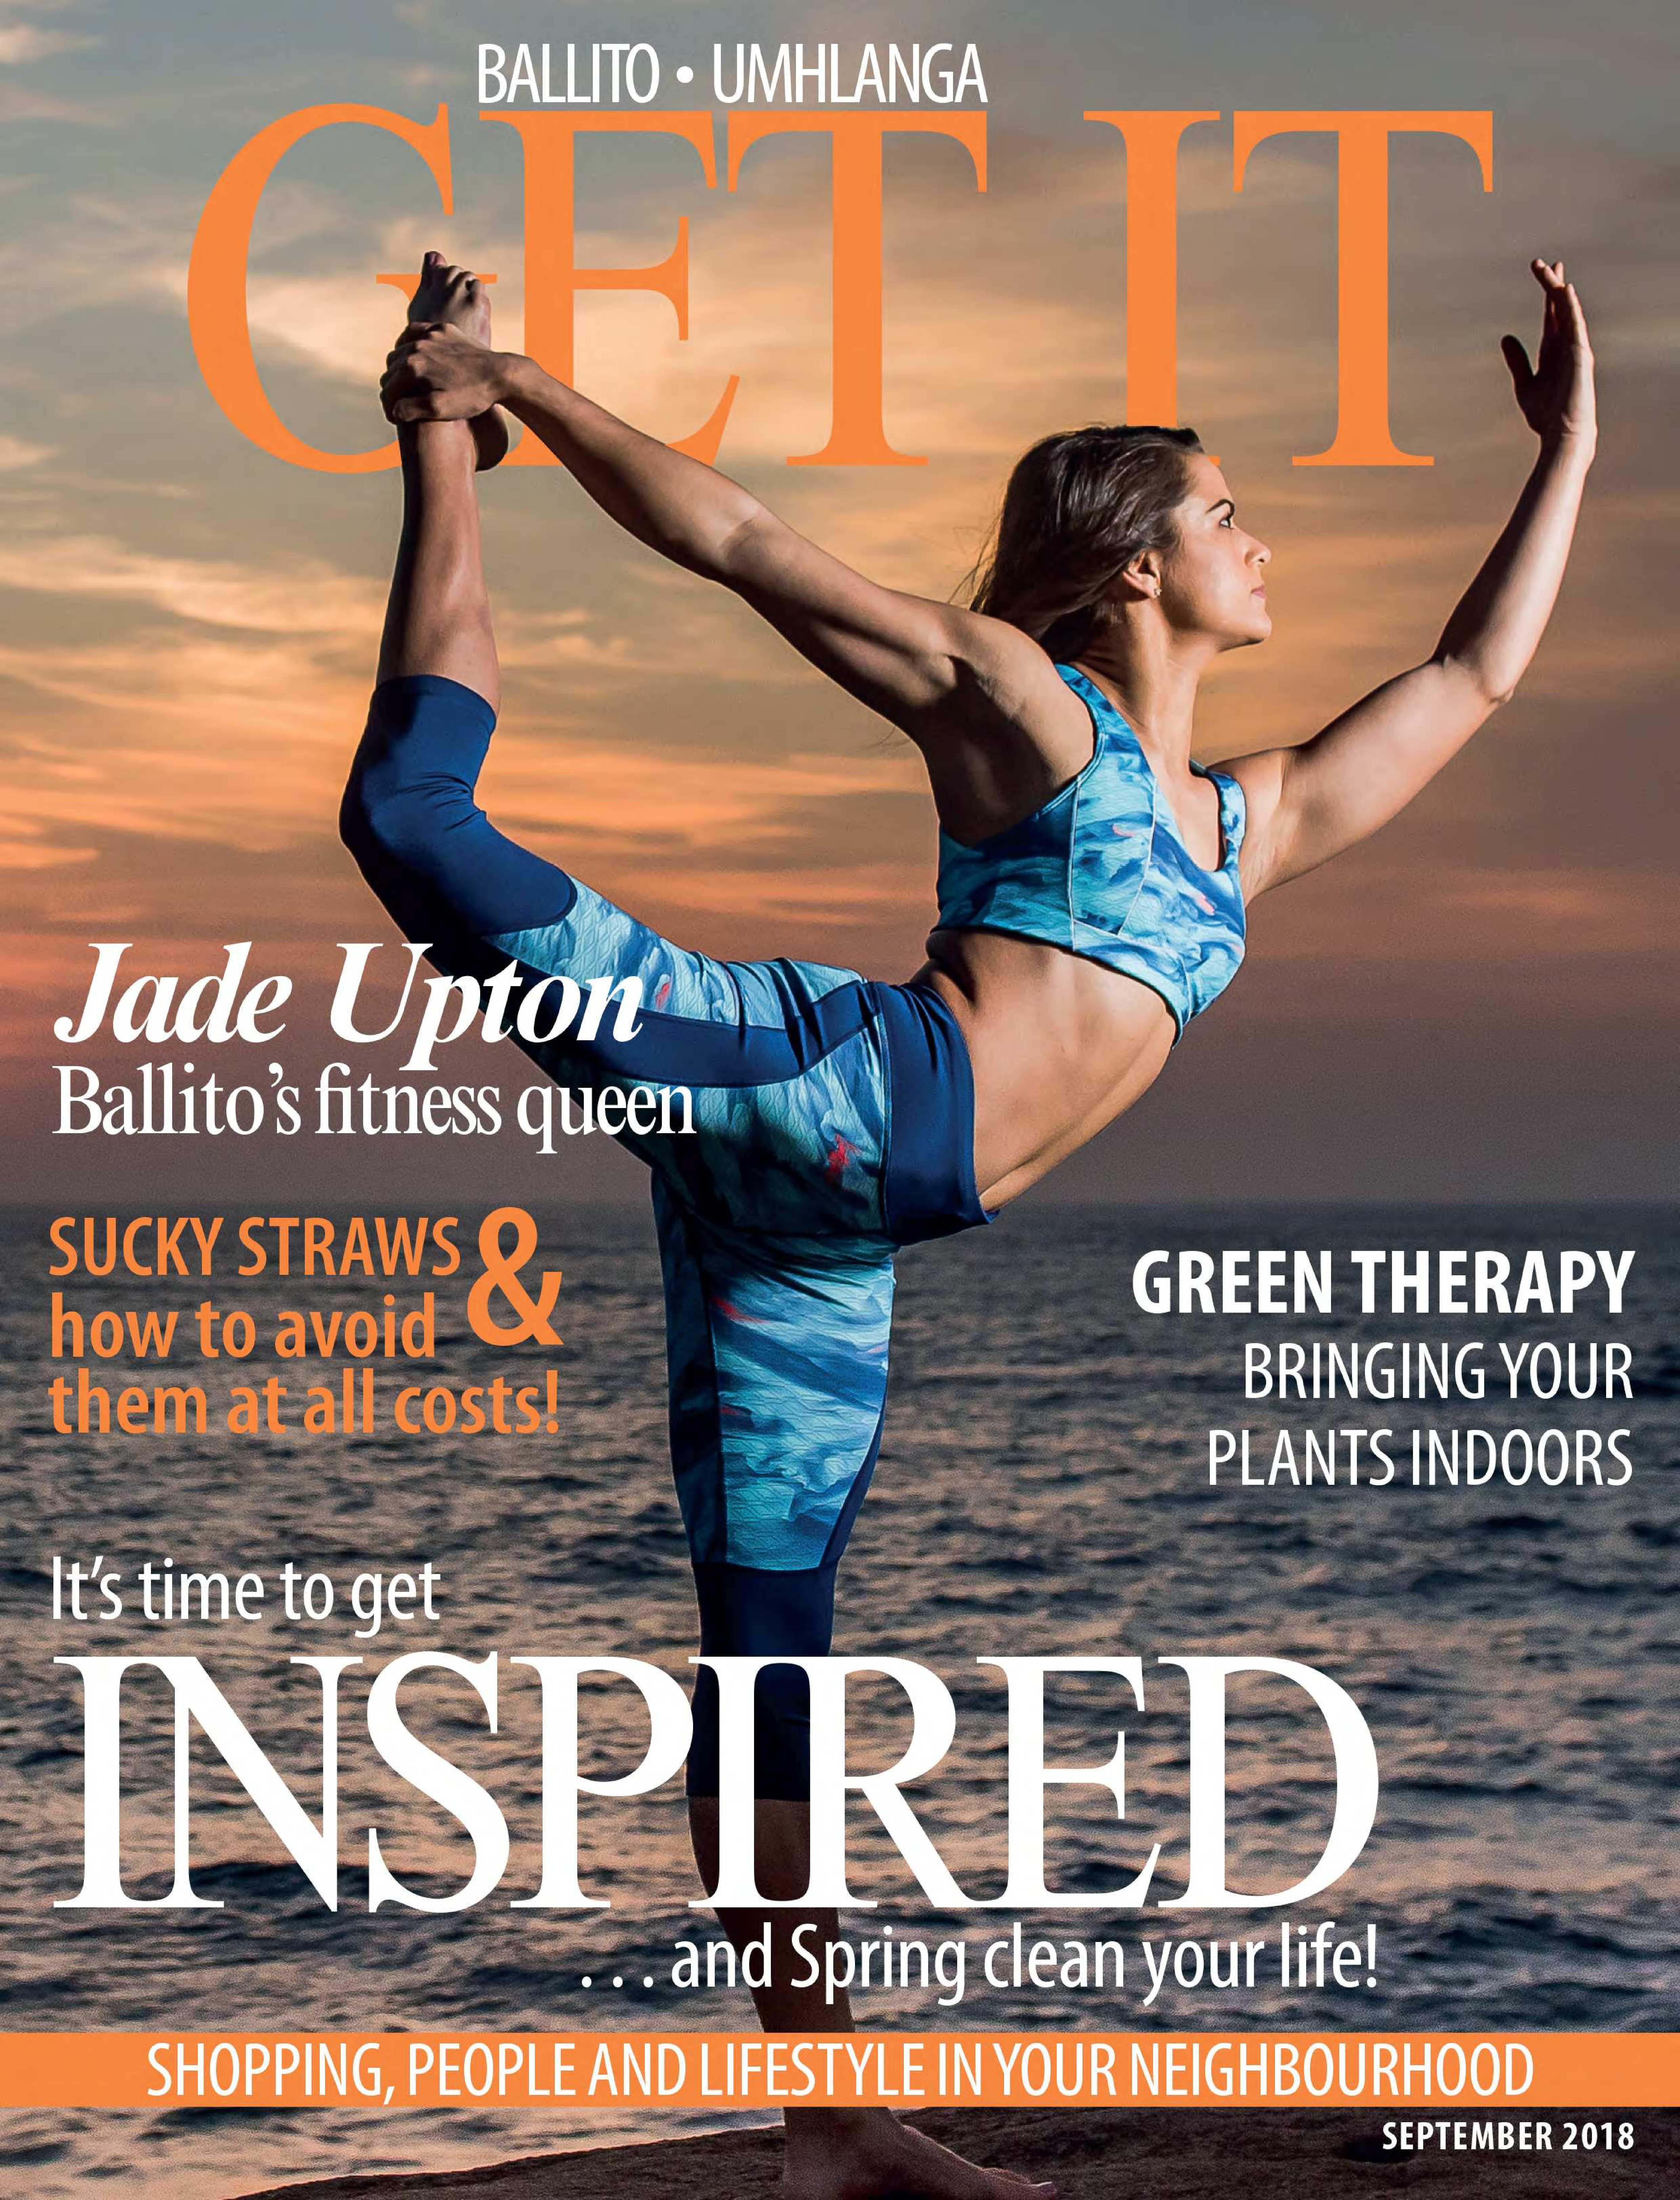 get-magazine-ballitoumhlanga-september-2018-epapers-page-1